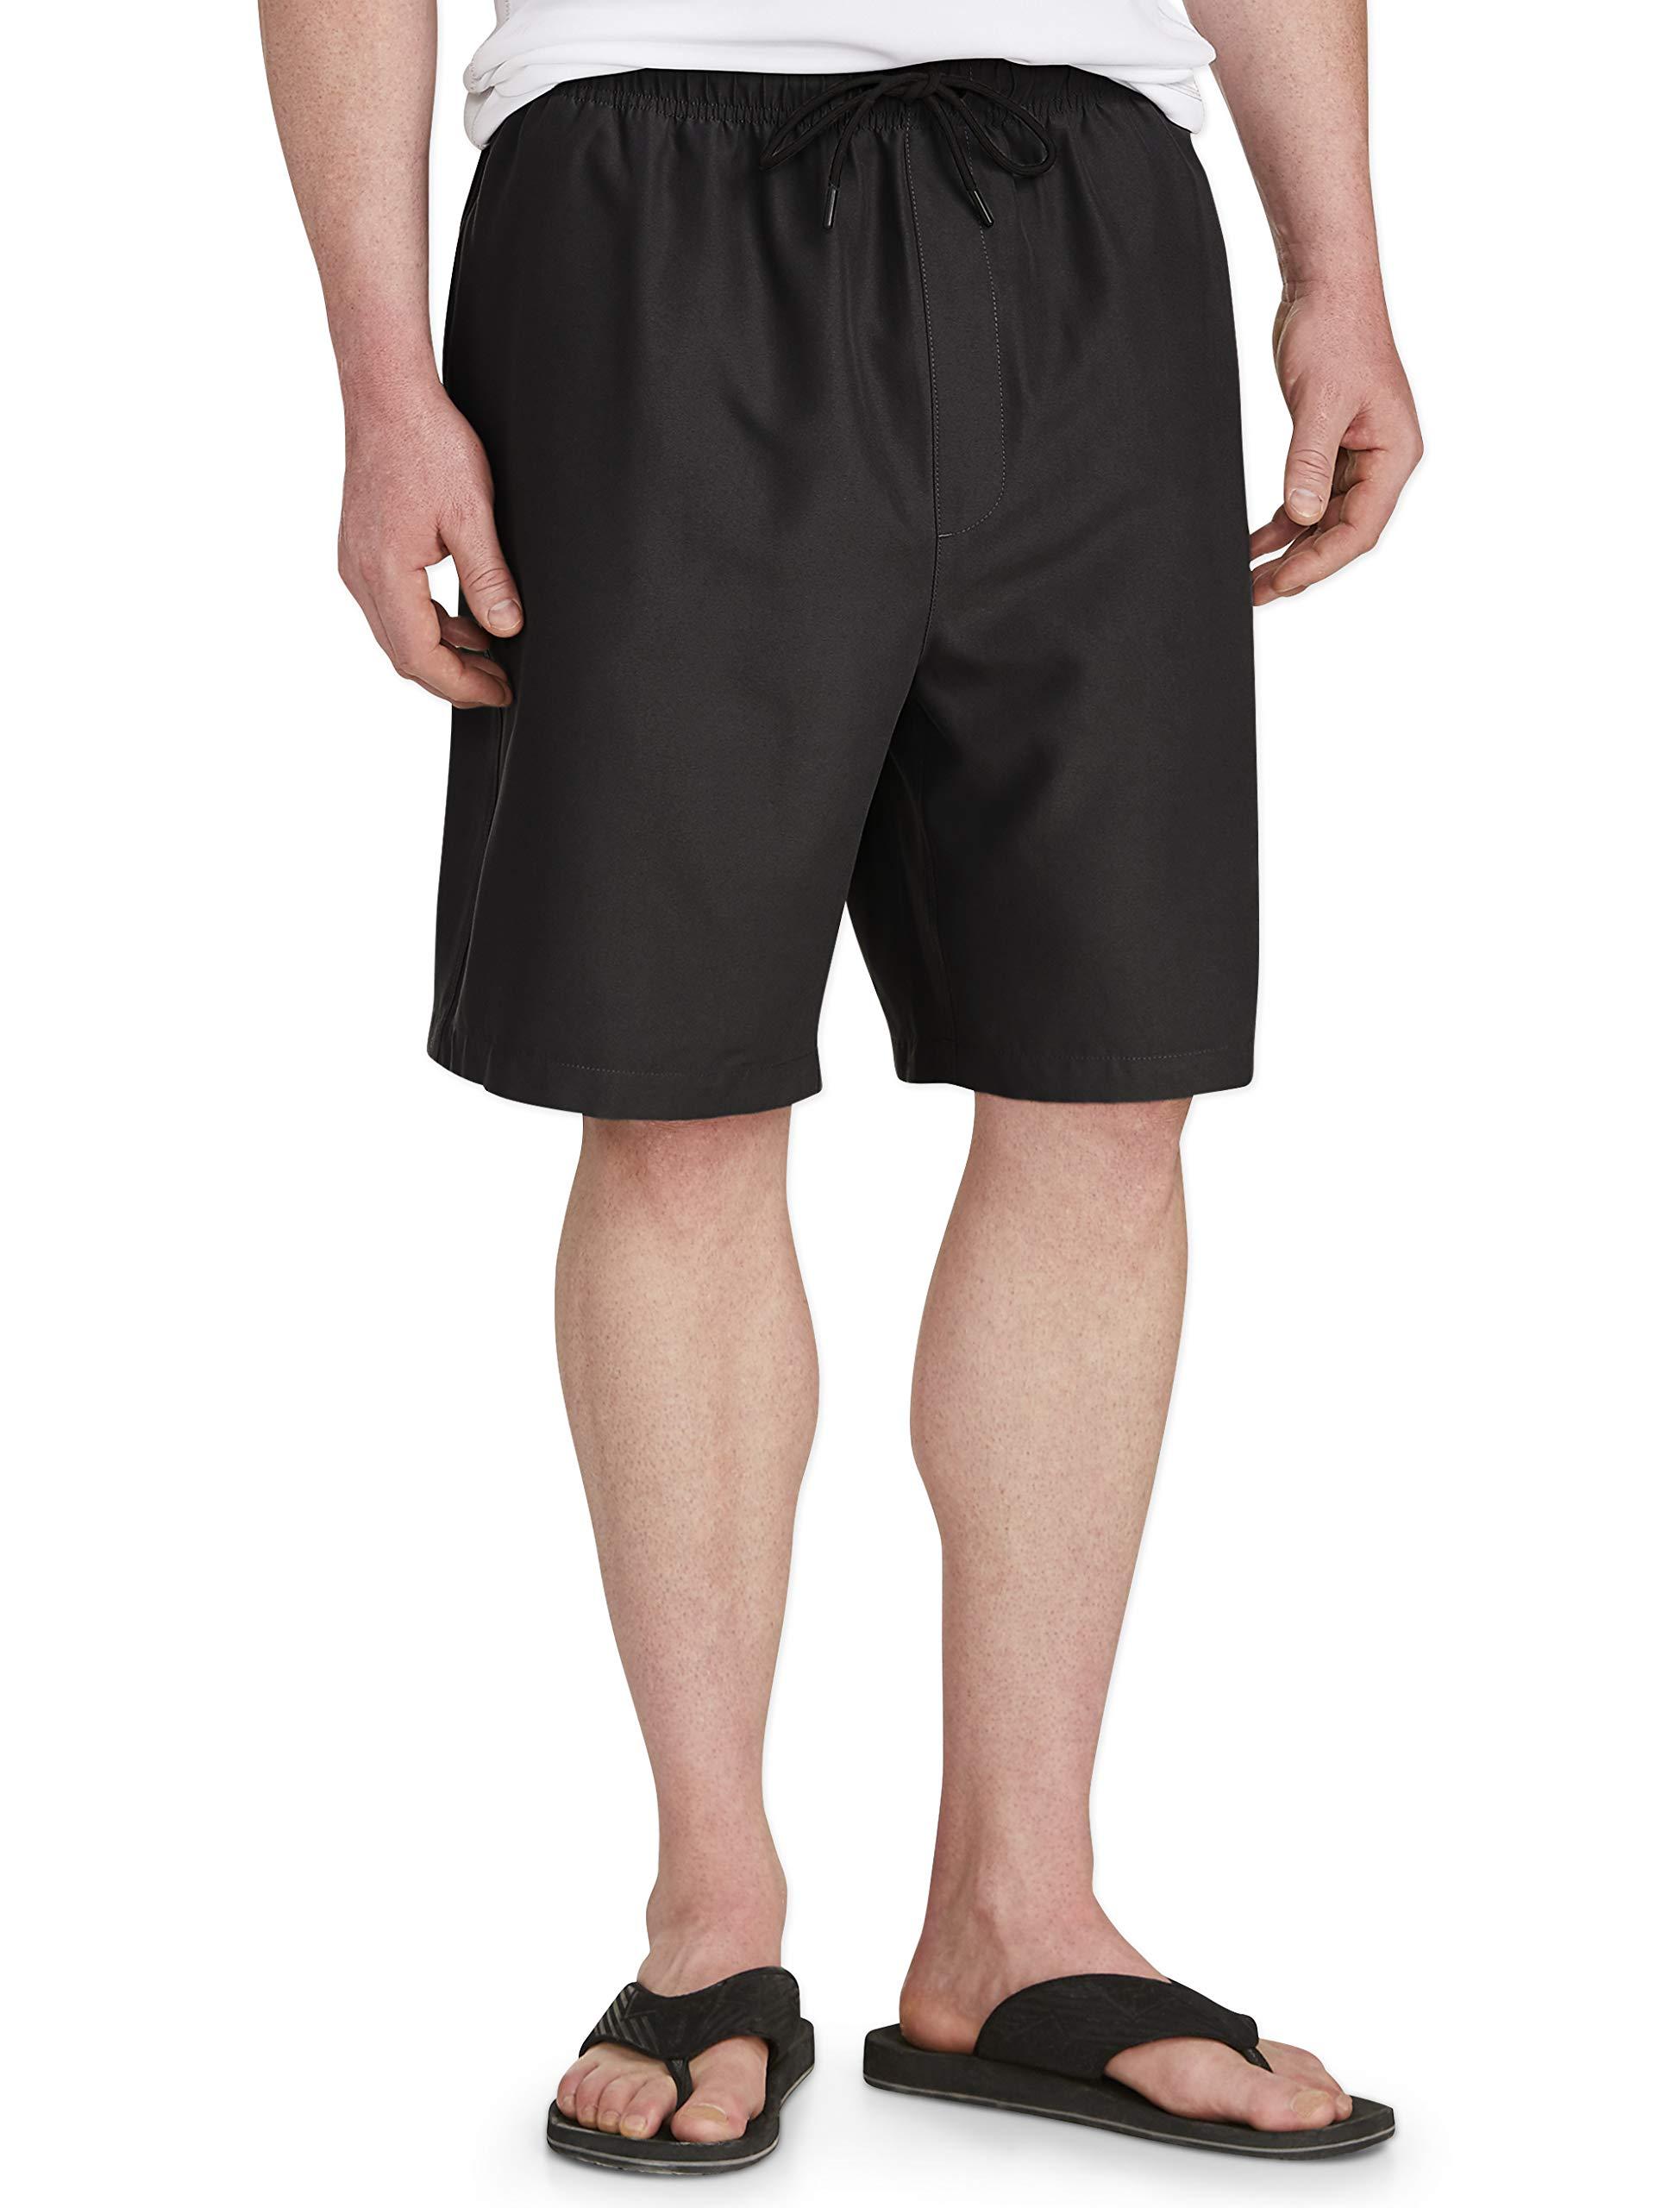 Amazon Essentials Men's Big & Tall Quick-Dry Swim Trunk fit by DXL, Black, 3XL by Amazon Essentials